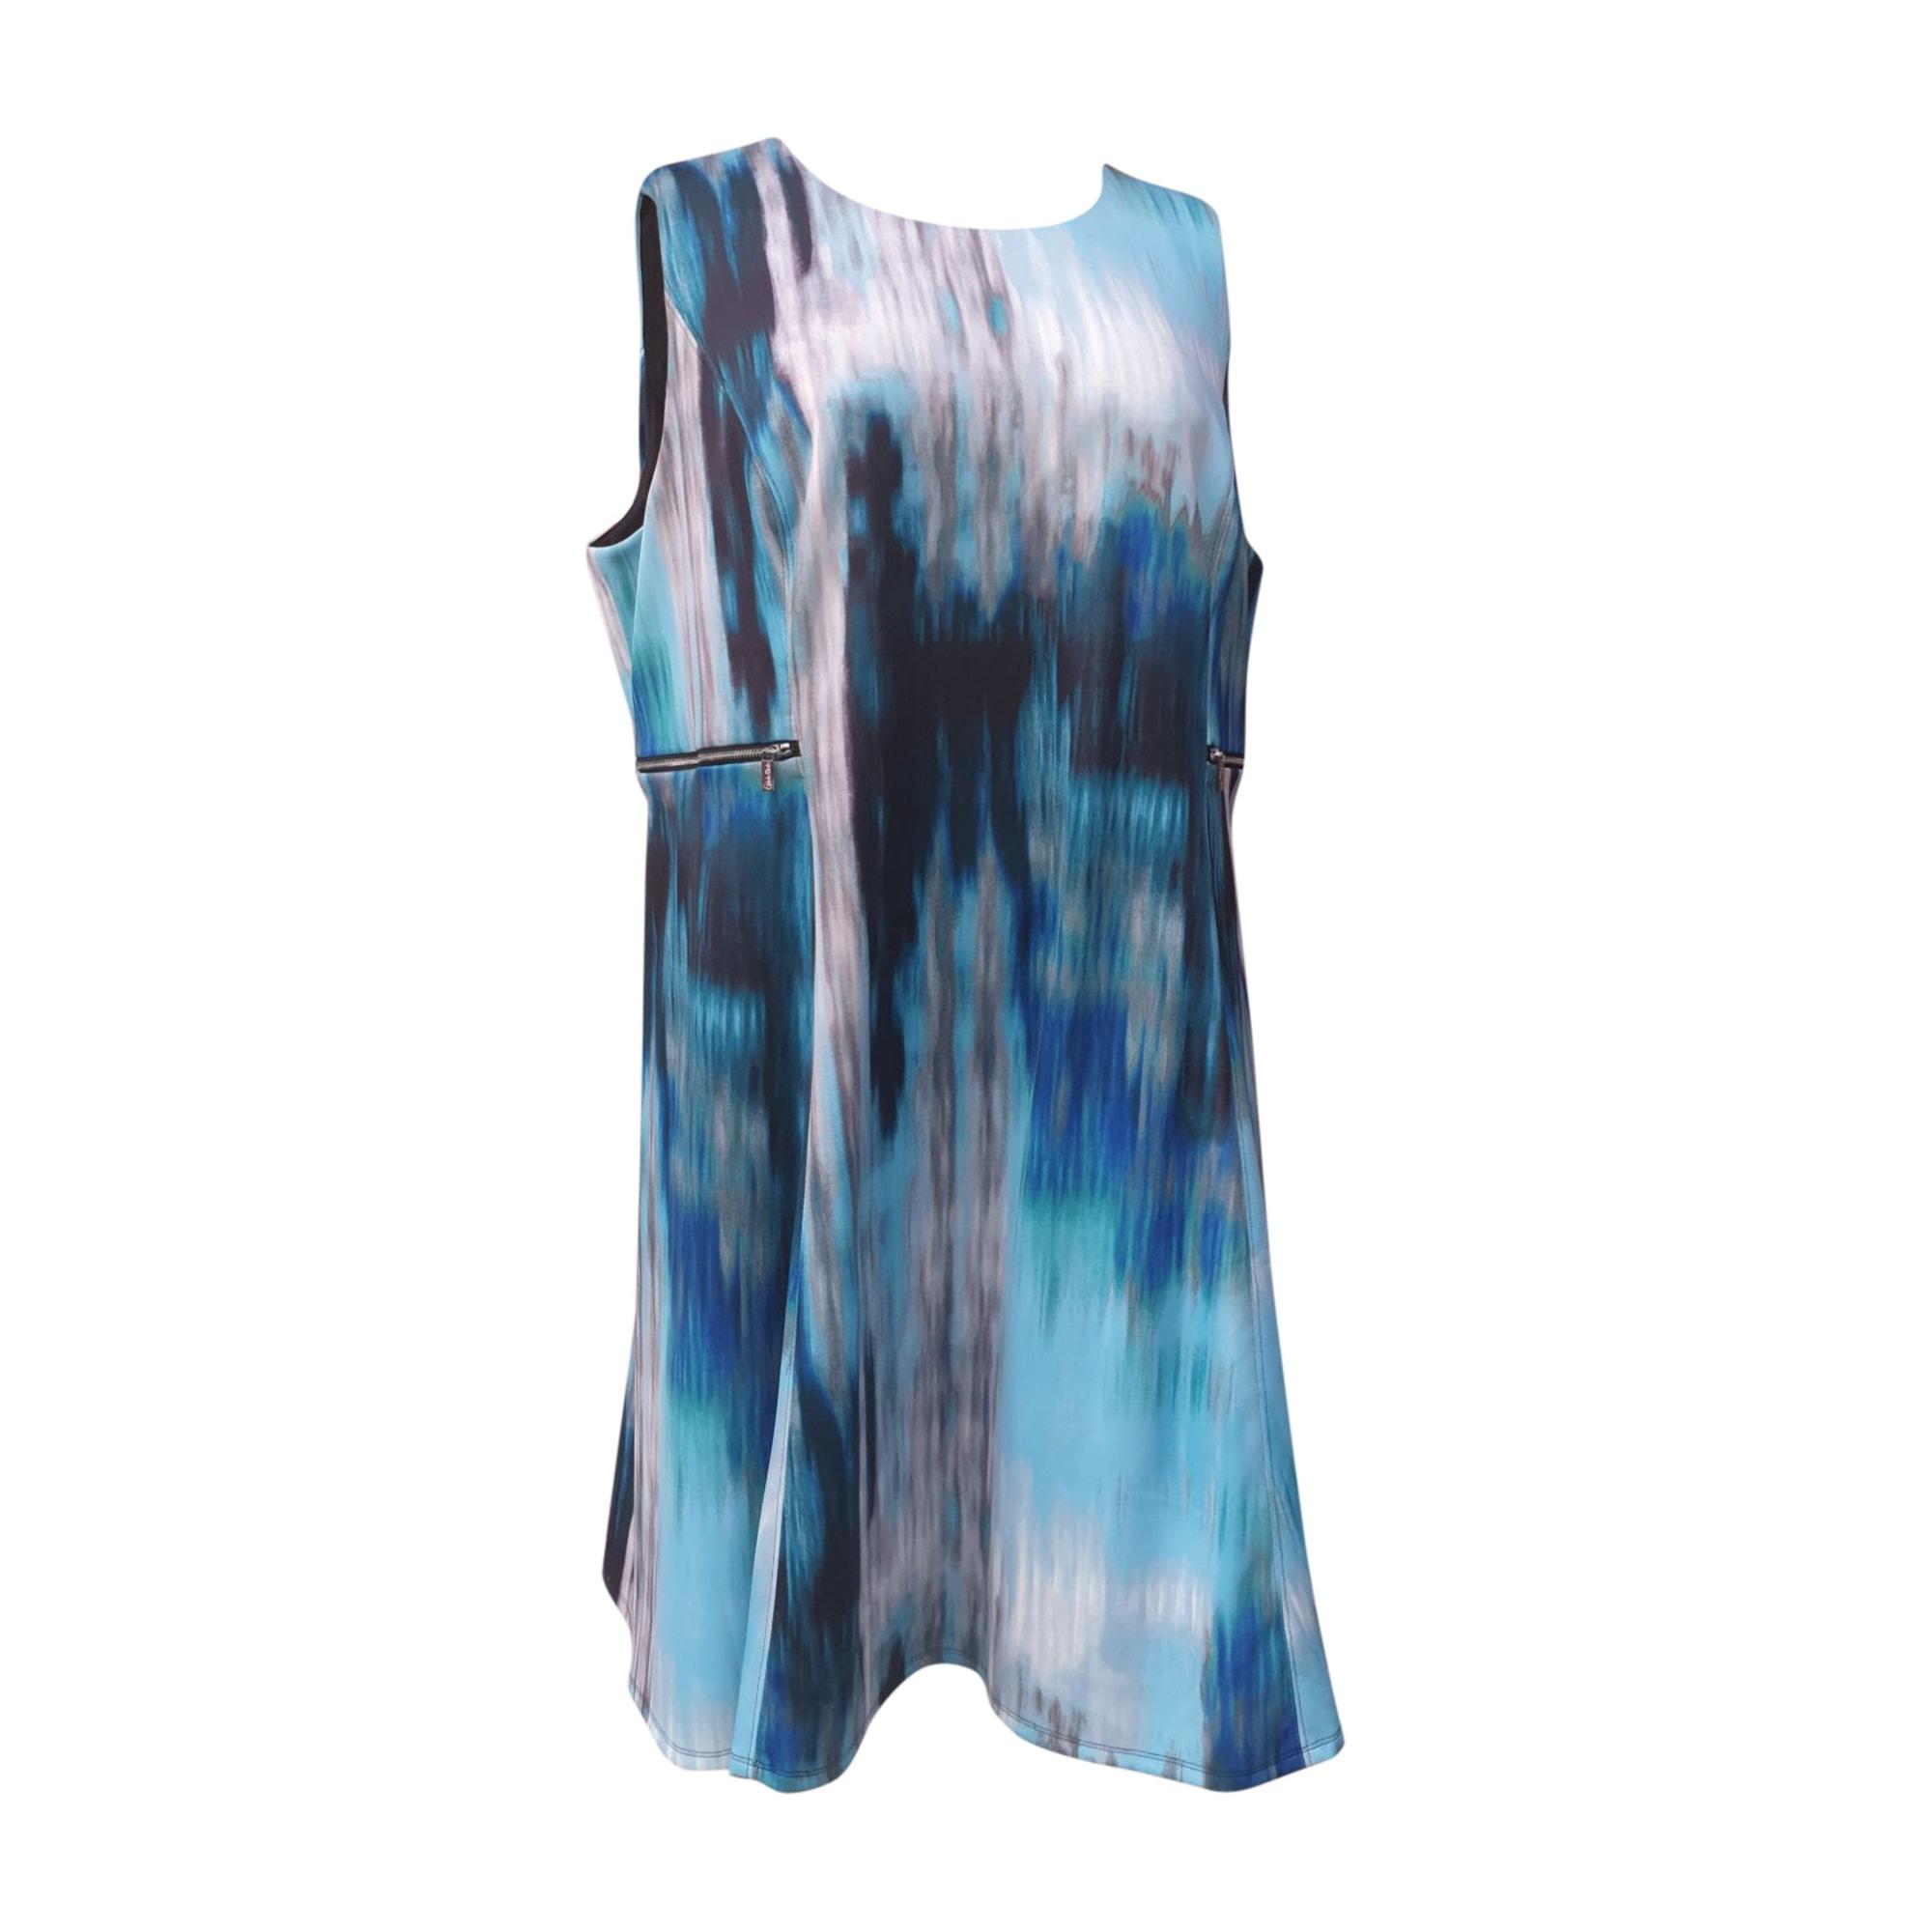 Robe courte CALVIN KLEIN Bleu, bleu marine, bleu turquoise